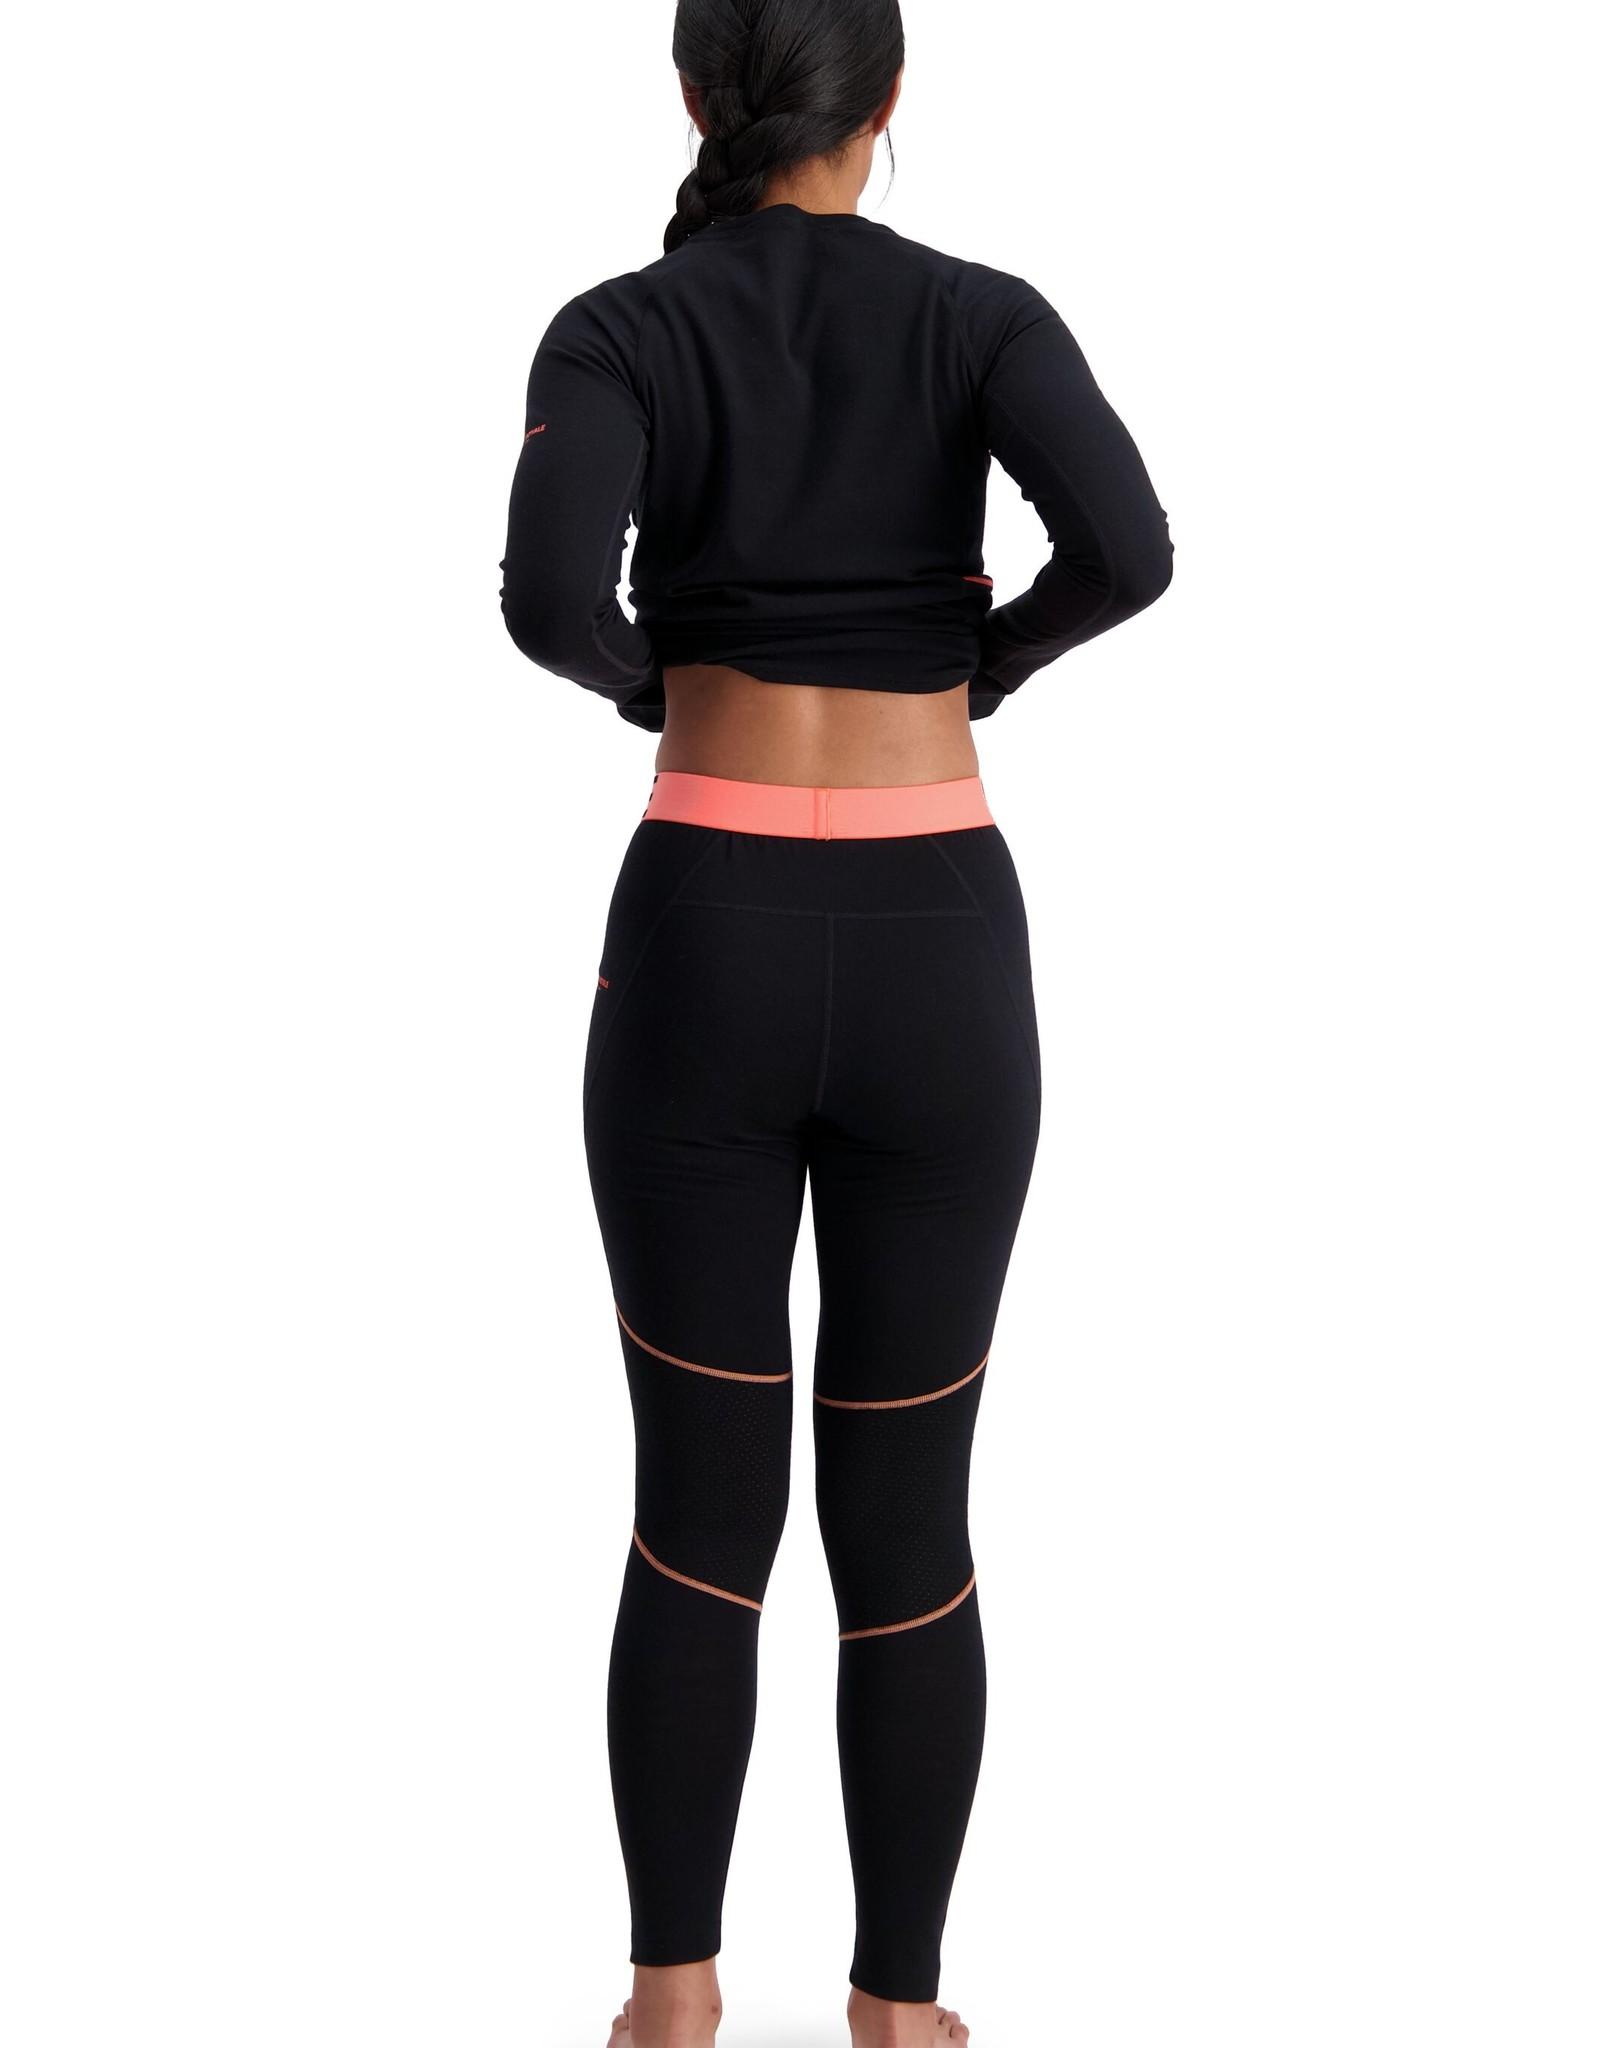 Mons Royale Mons Royale Olympus 3.0 Legging-Black-Women's -W2020